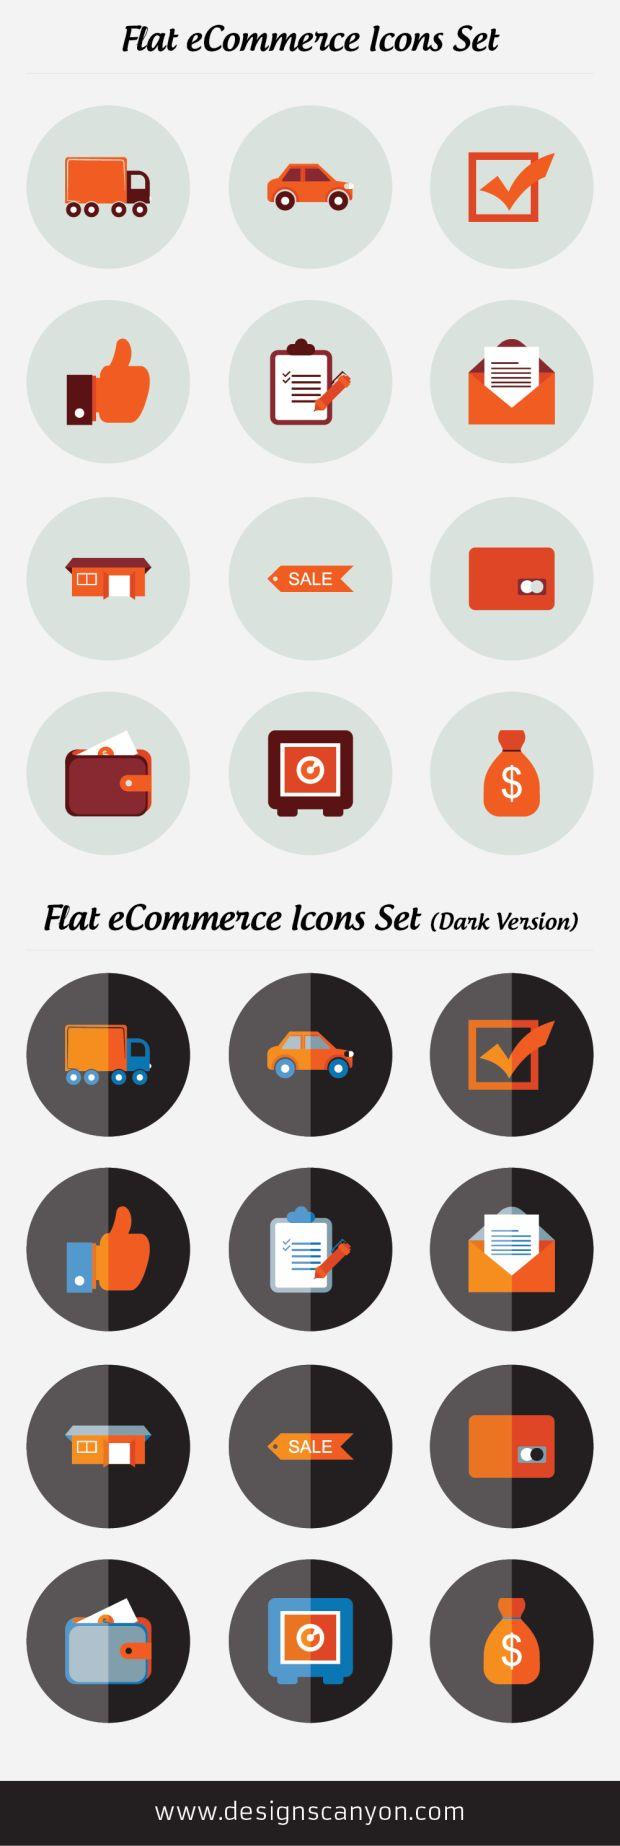 Flat eCommerce Icons Set Free Download